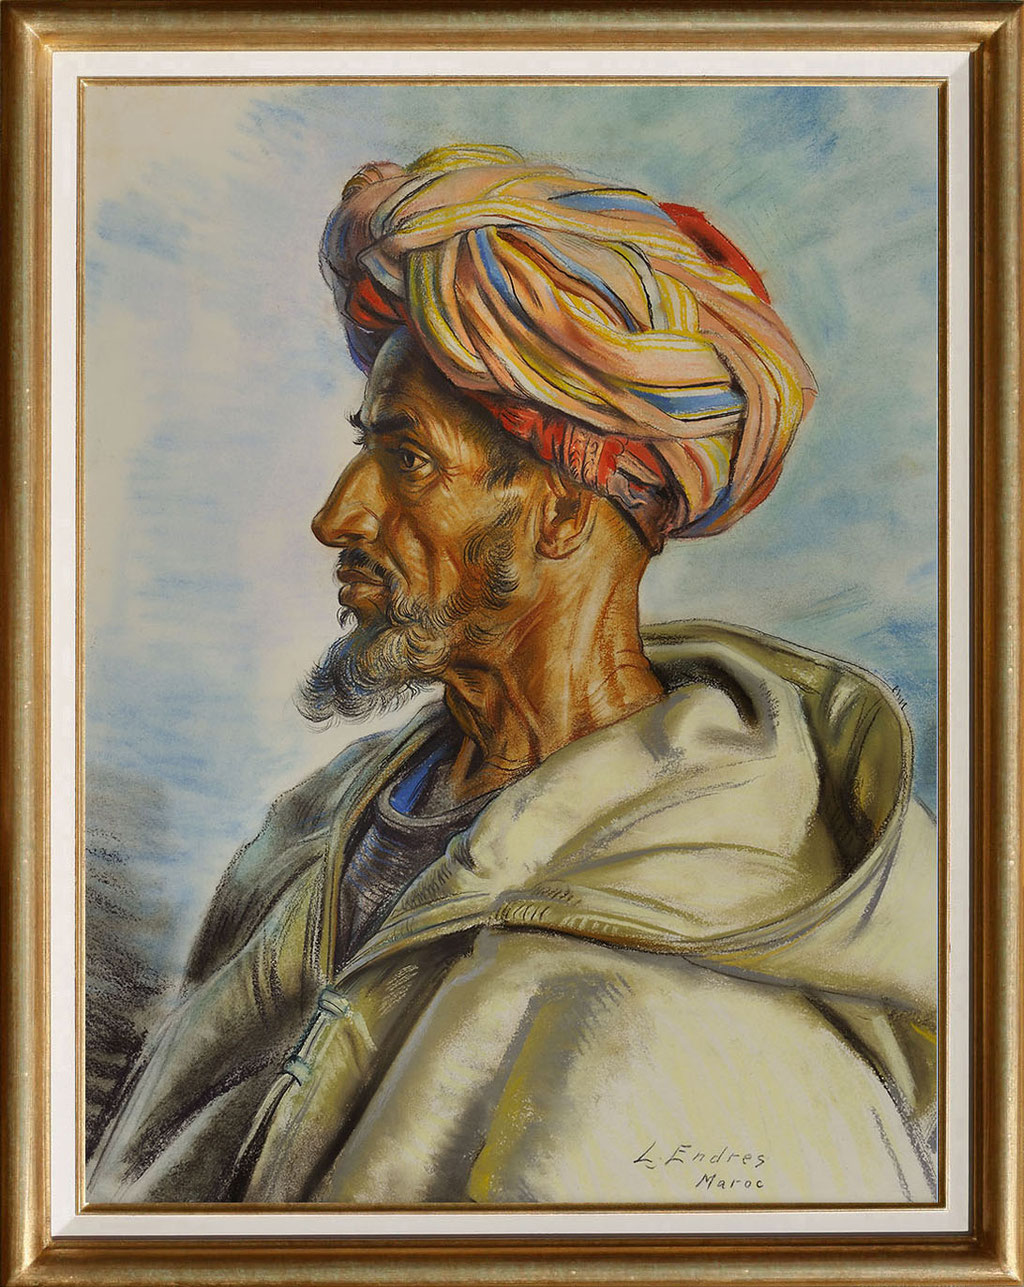 Endres, le marocain au turban